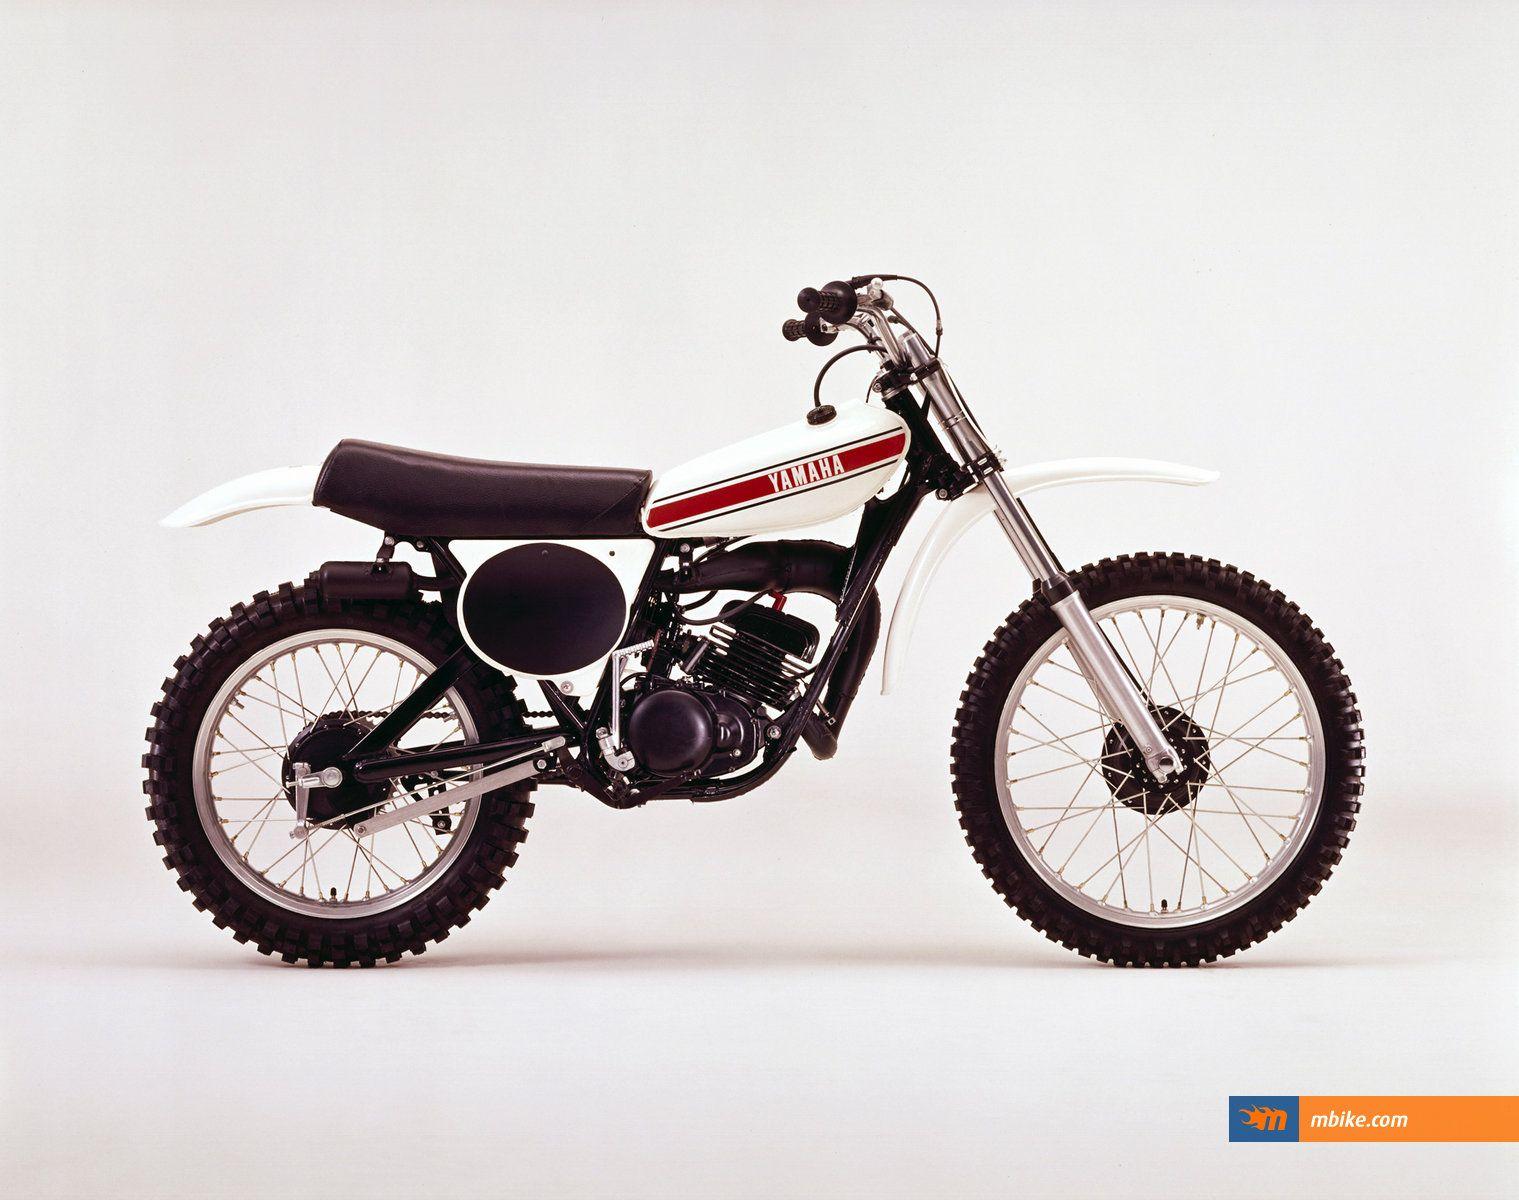 1975 Yamaha Yz 125 C Vintage Motocross Yamaha Cafe Racer Yamaha Yz 125